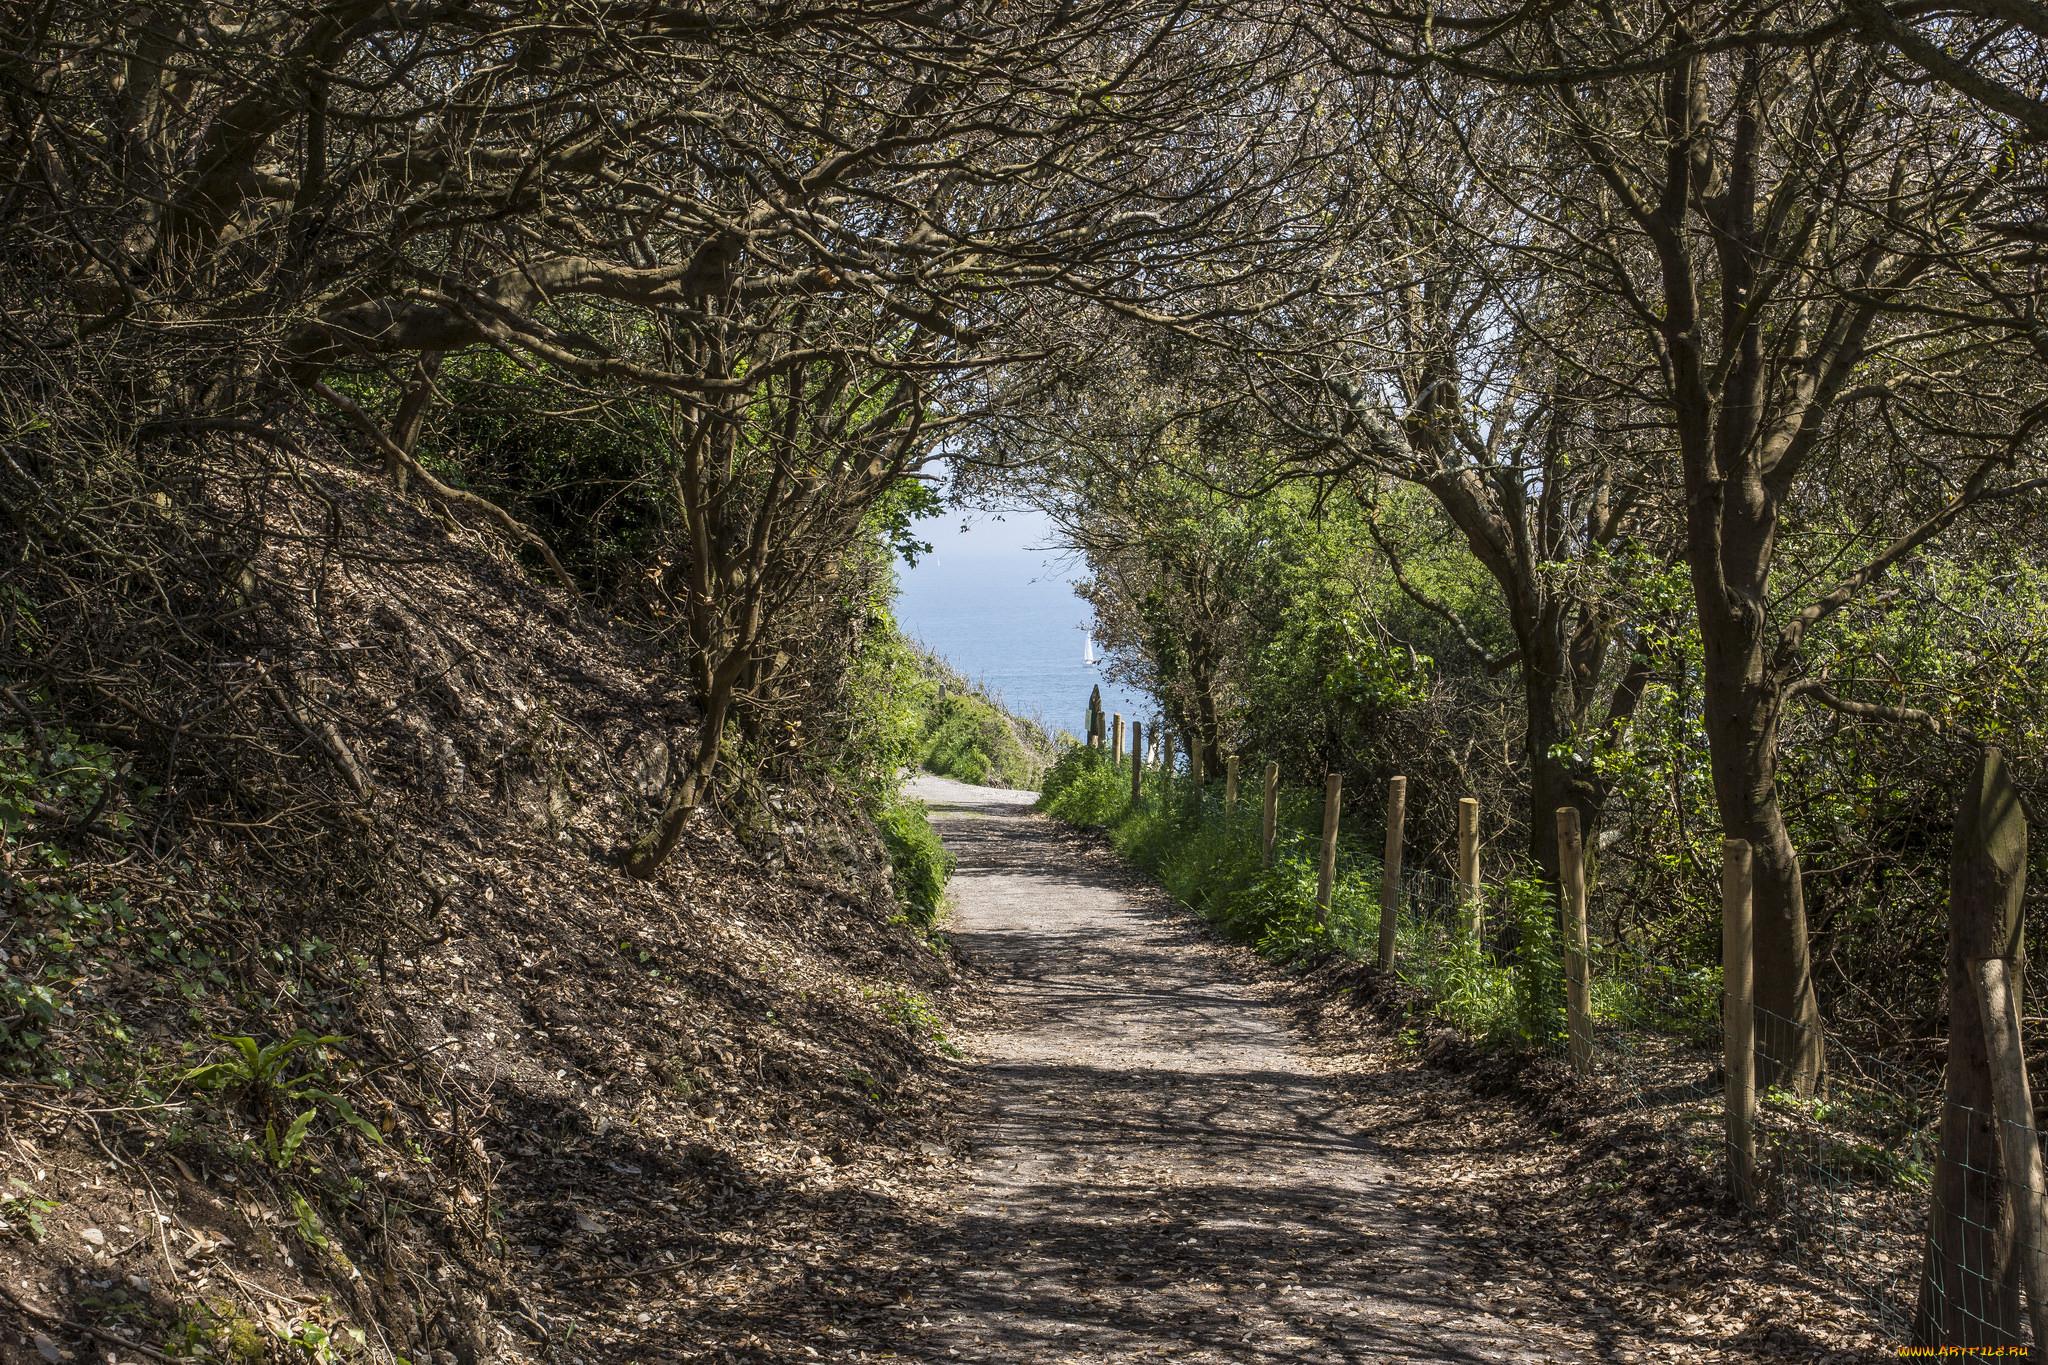 природа, дороги, тропинка, деревья